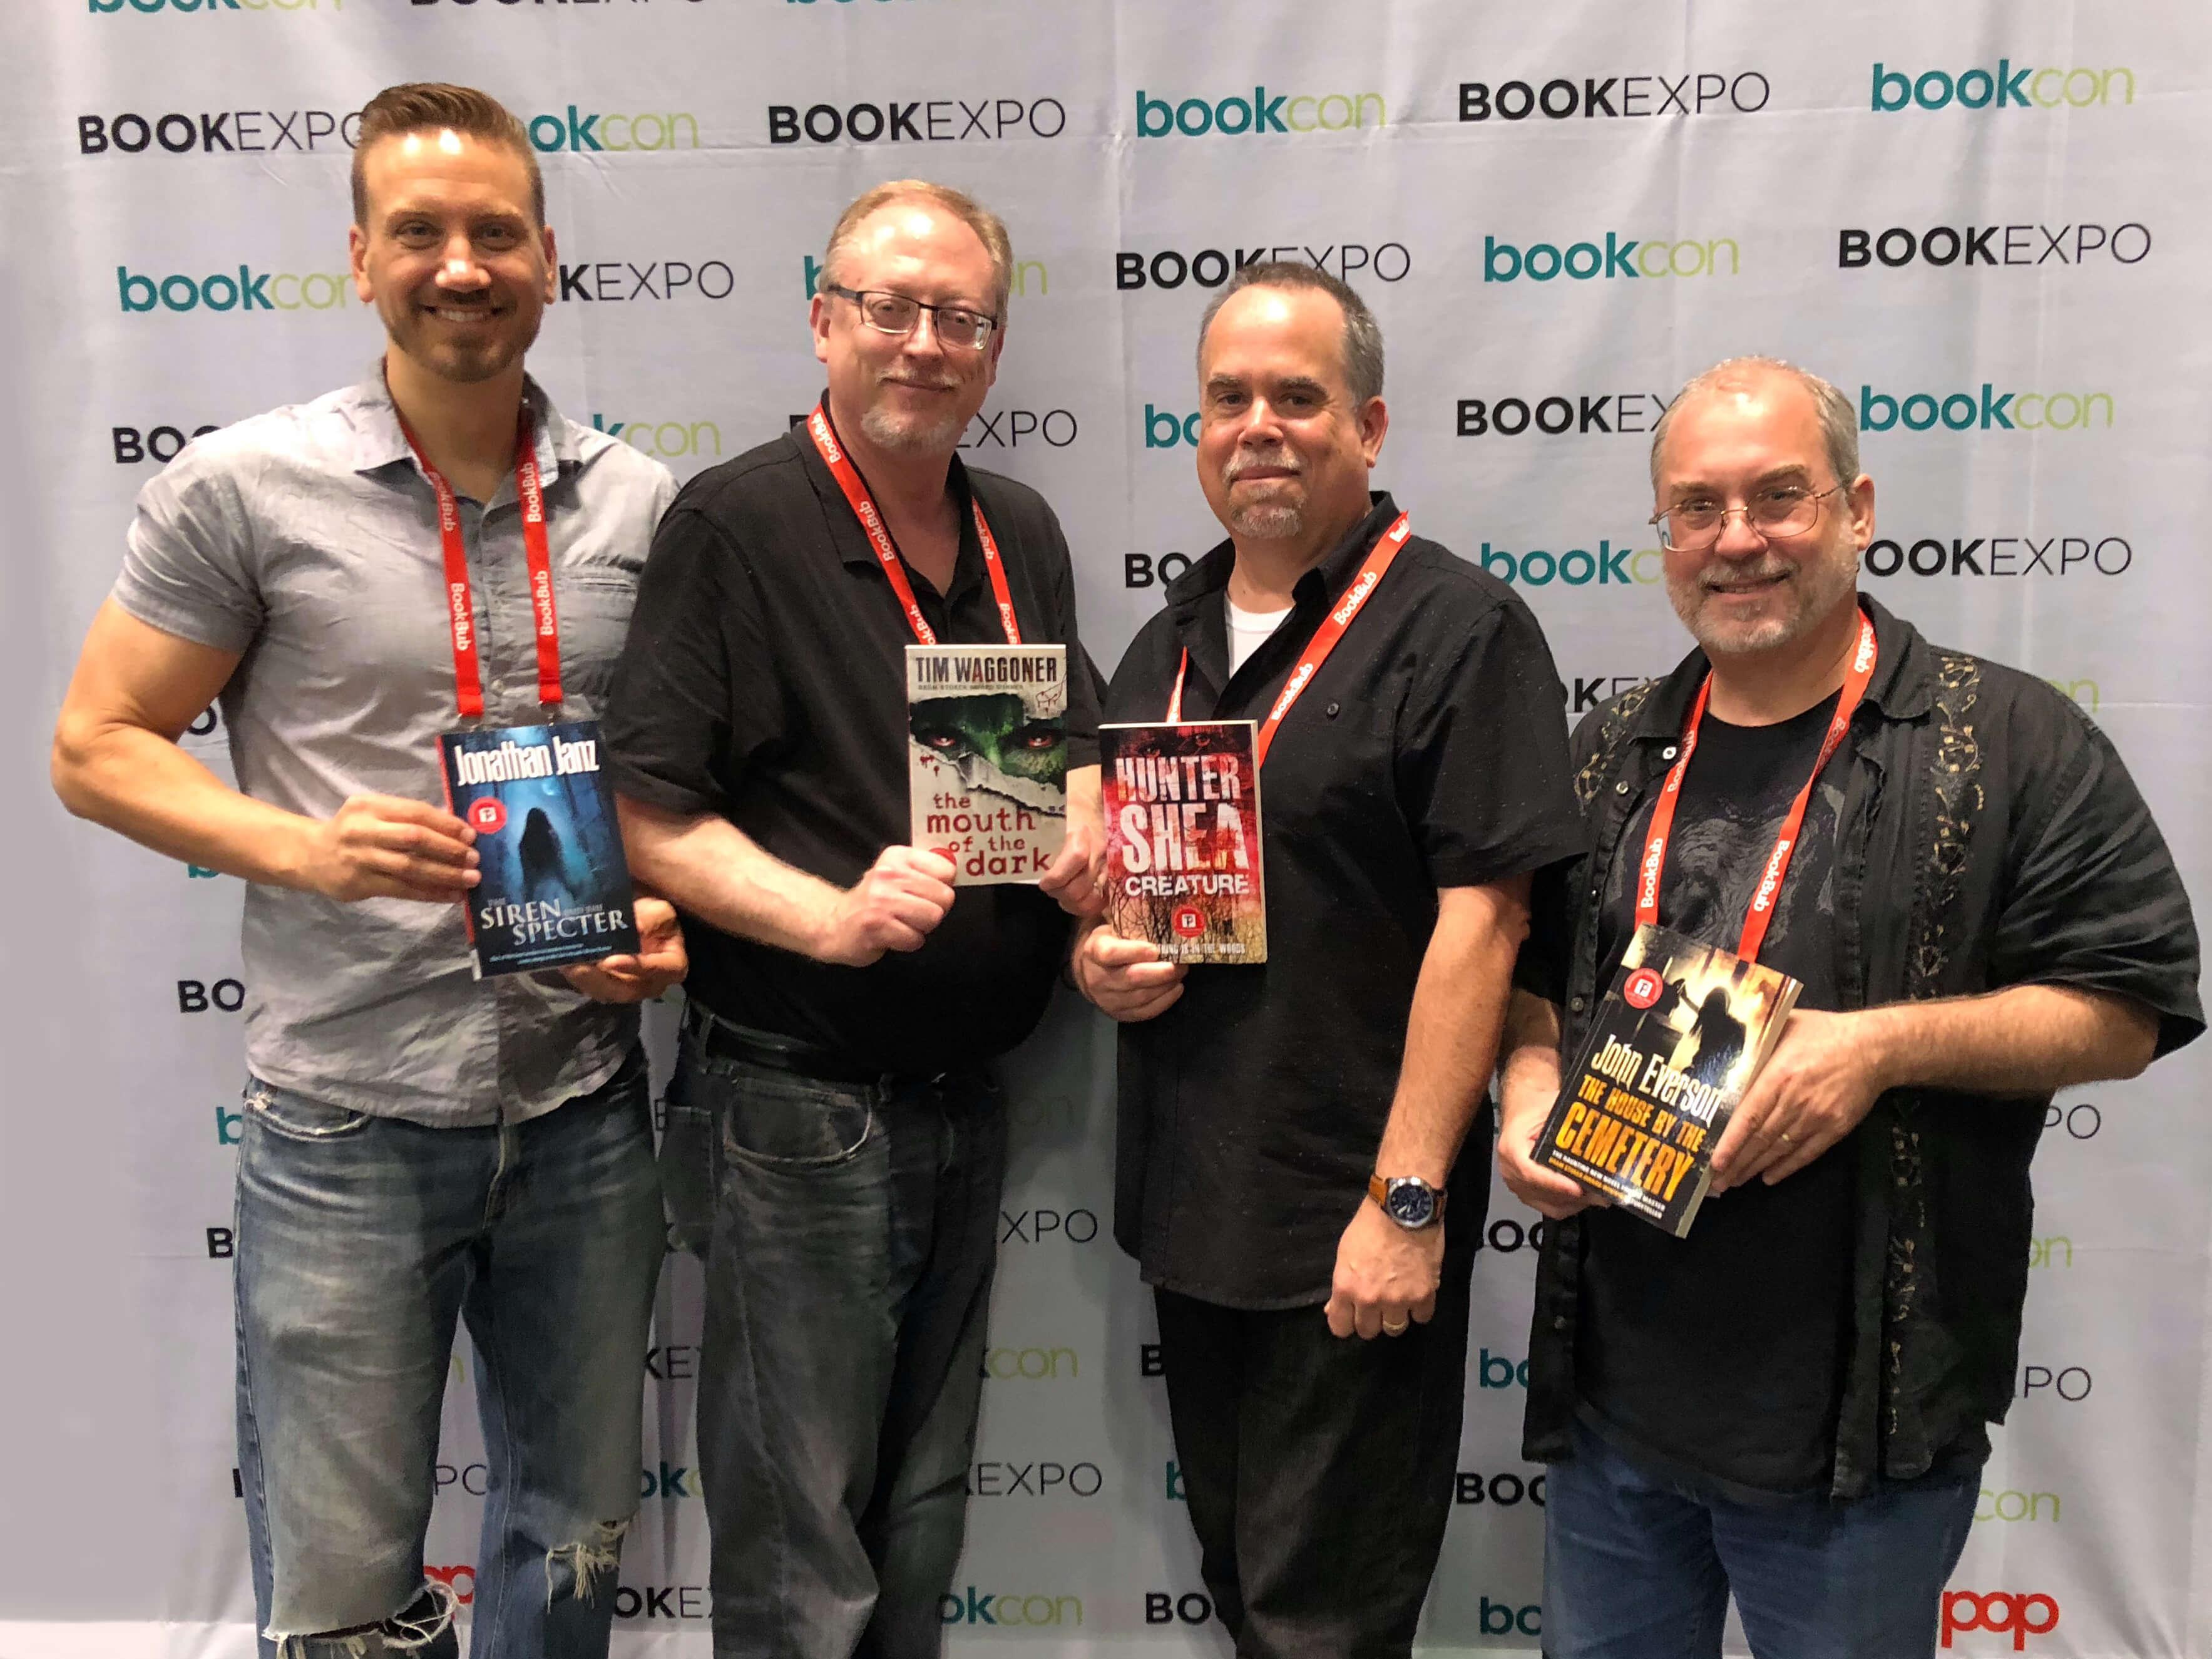 Jonathan Janz, Tim Waggoner, Hunter Shea, John Everson, Flame Tree Author Signing